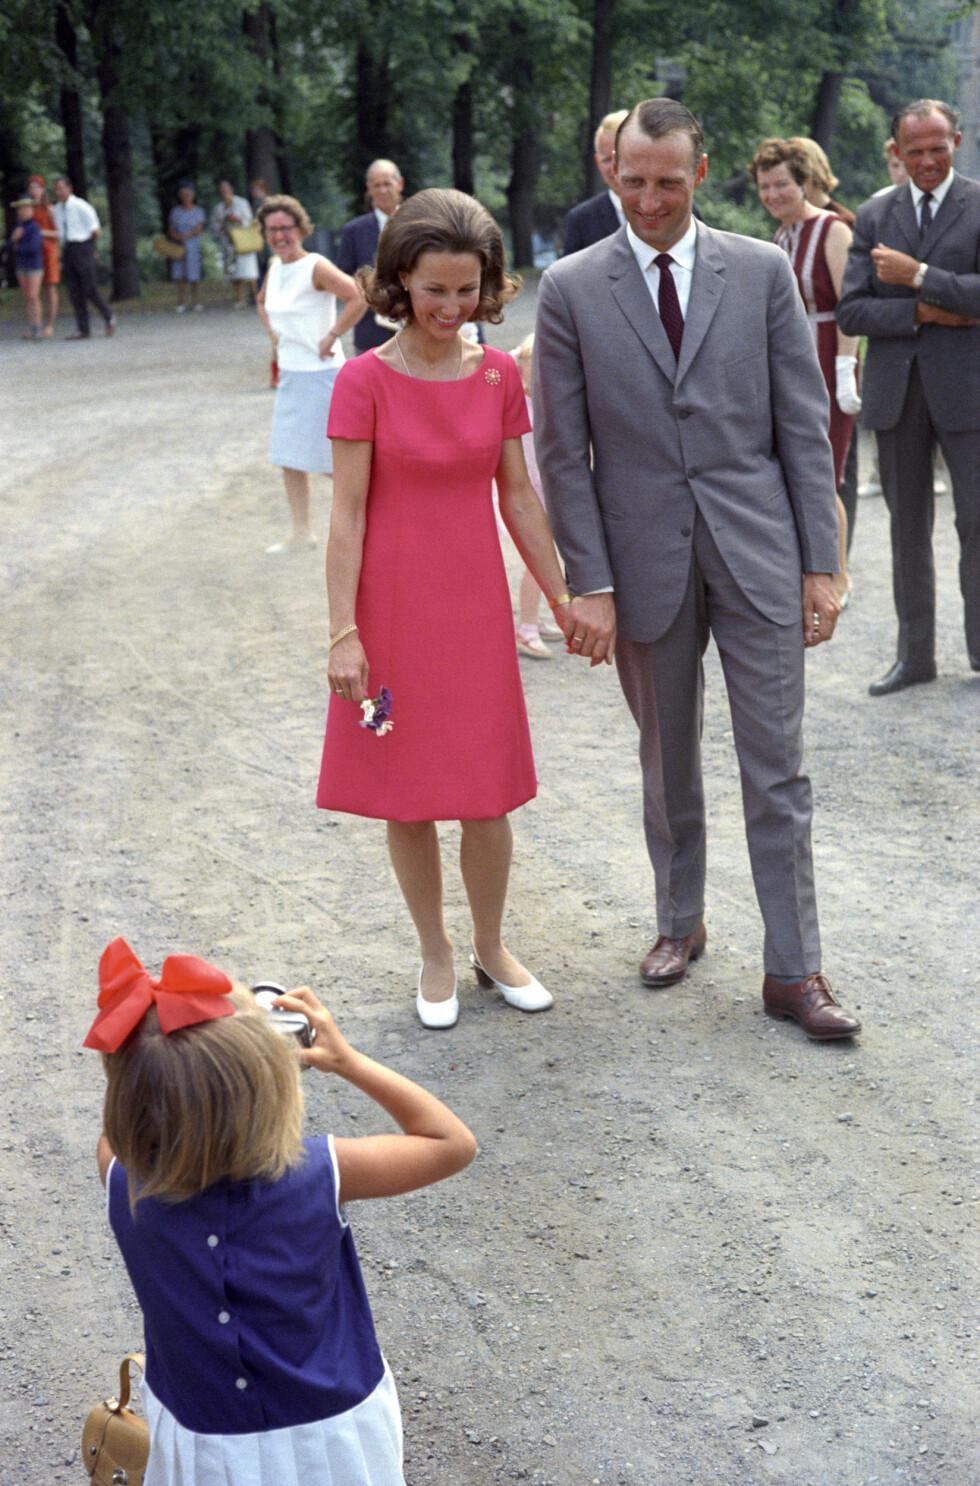 11 DAGER FØR BRYLLUPET: Kronprins Harald og Sonja Haraldsen på pressekonferanse i Dronningparken den 18. august 1968 - 11 dager før bryllupet.  Foto:  Foto: NTB Scanpix